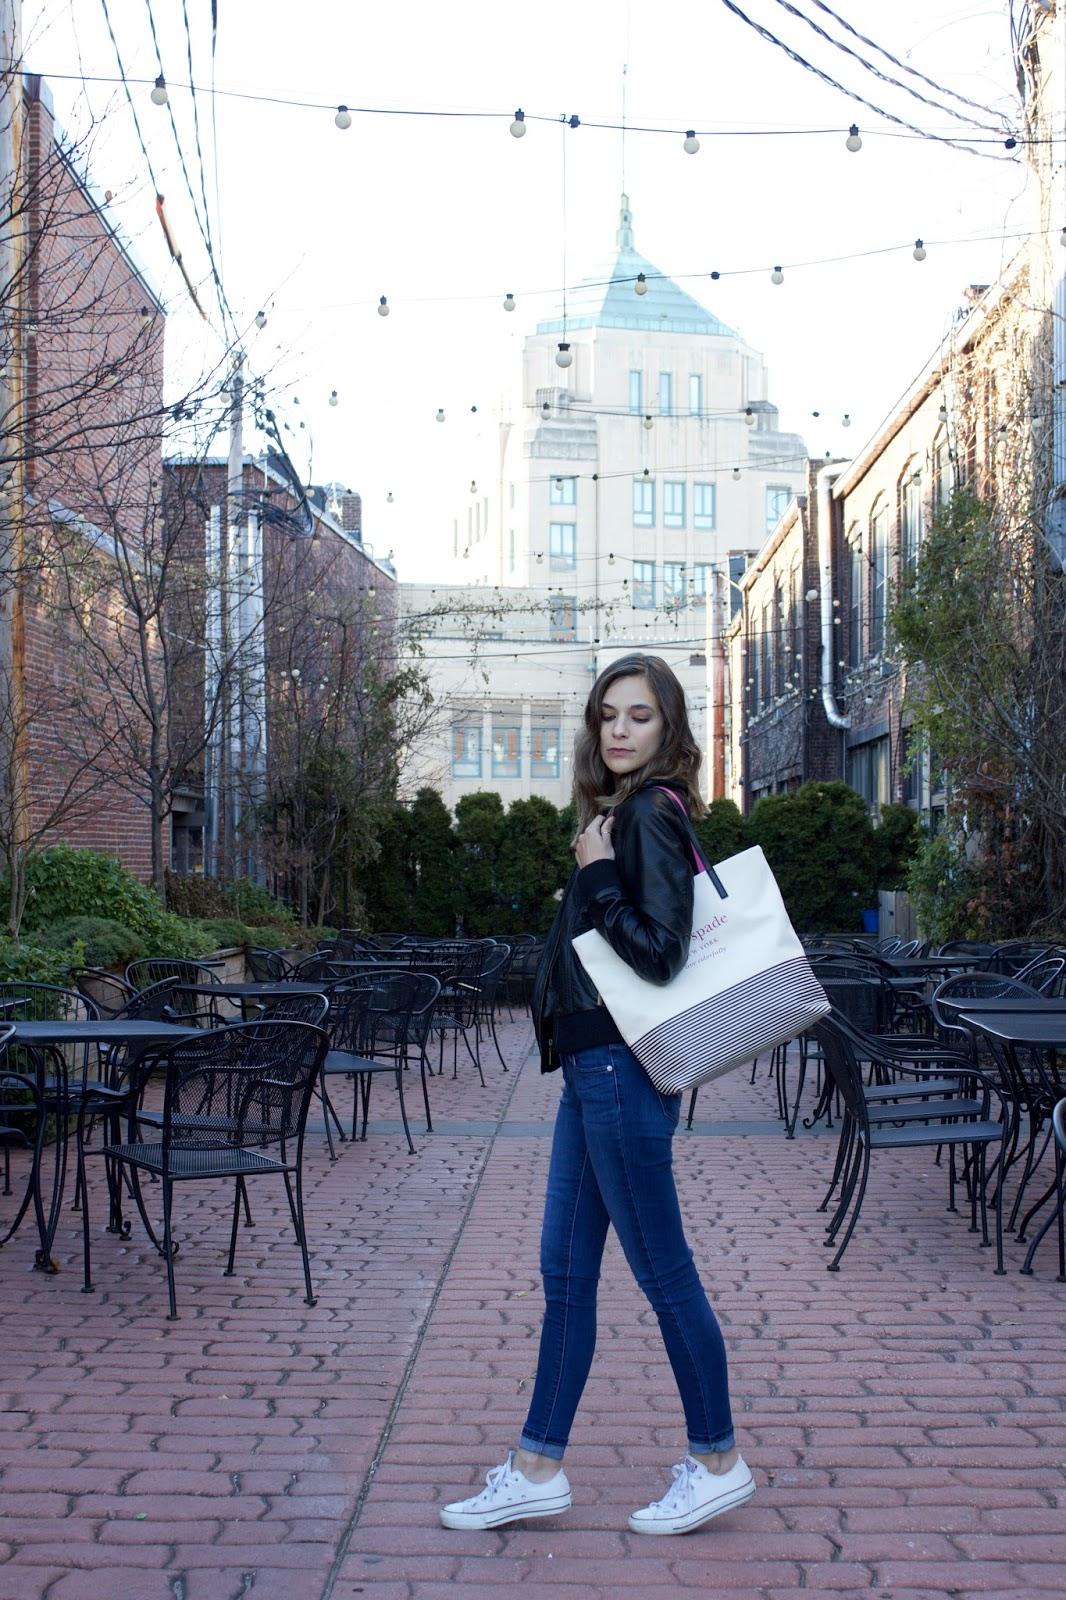 Kate Spade New York tote